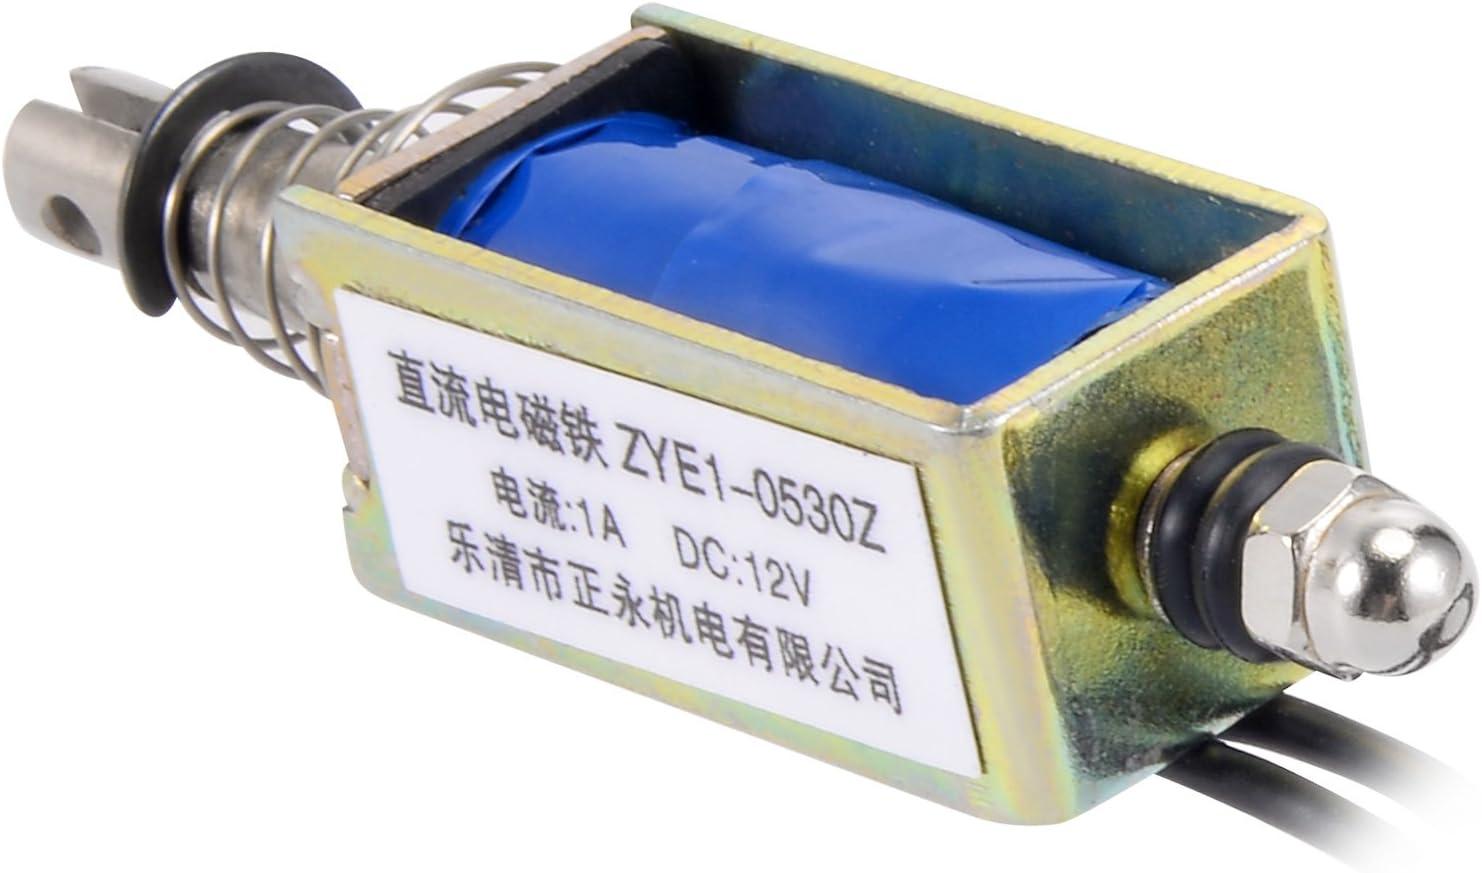 Almencla DC220V Elettromagnete a Solenoide a Telaio Aperto Tipo Push 34,5 Mm 20N 2KG